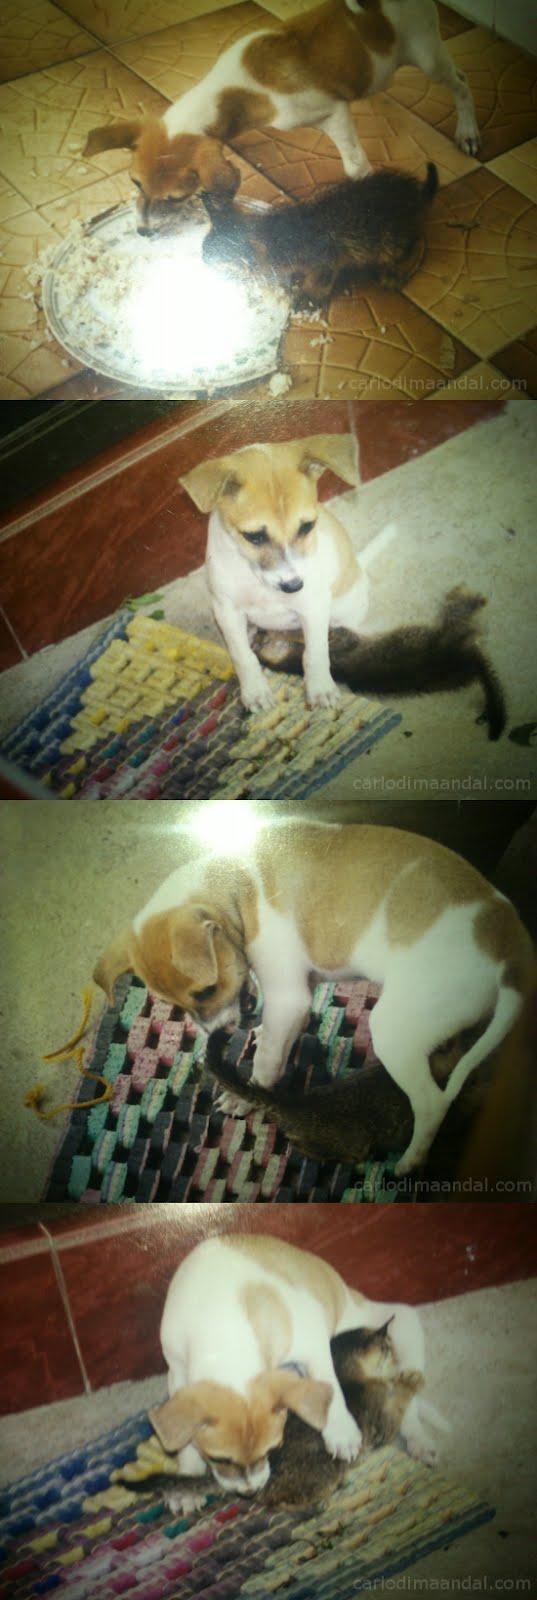 Dog and cat lovin